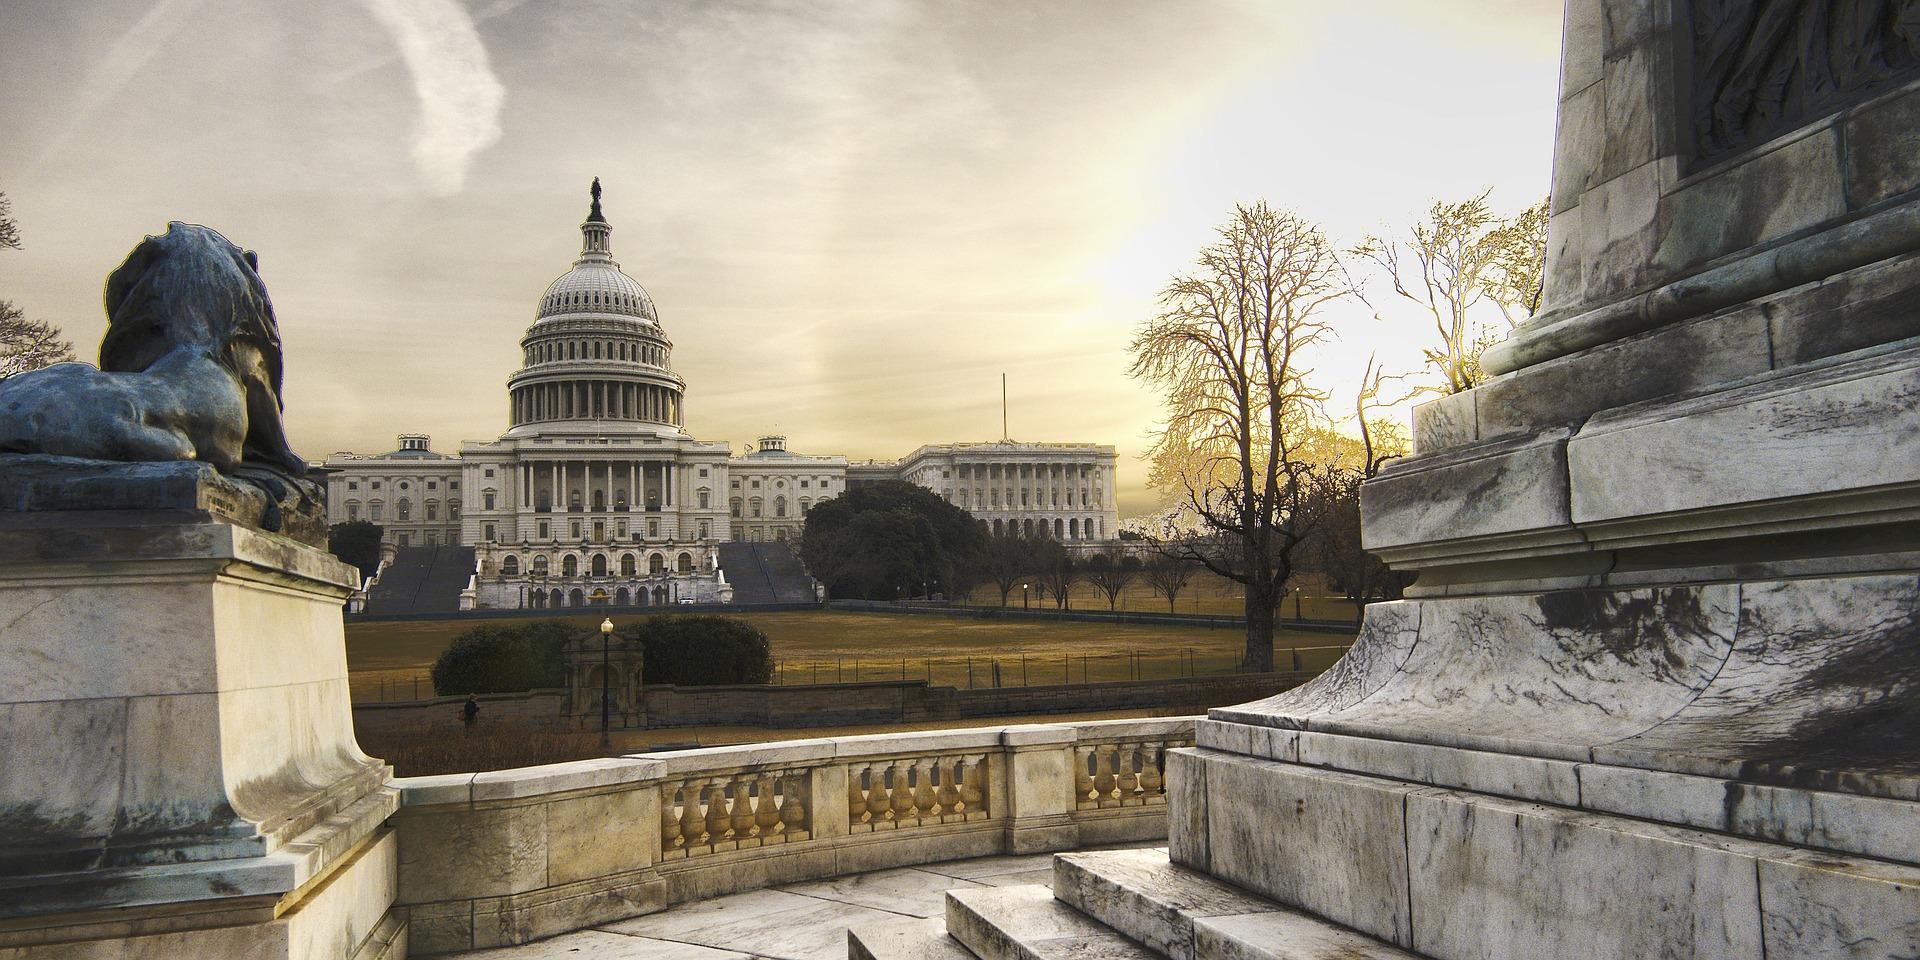 Capitol Building (Image credit: Pixabay)